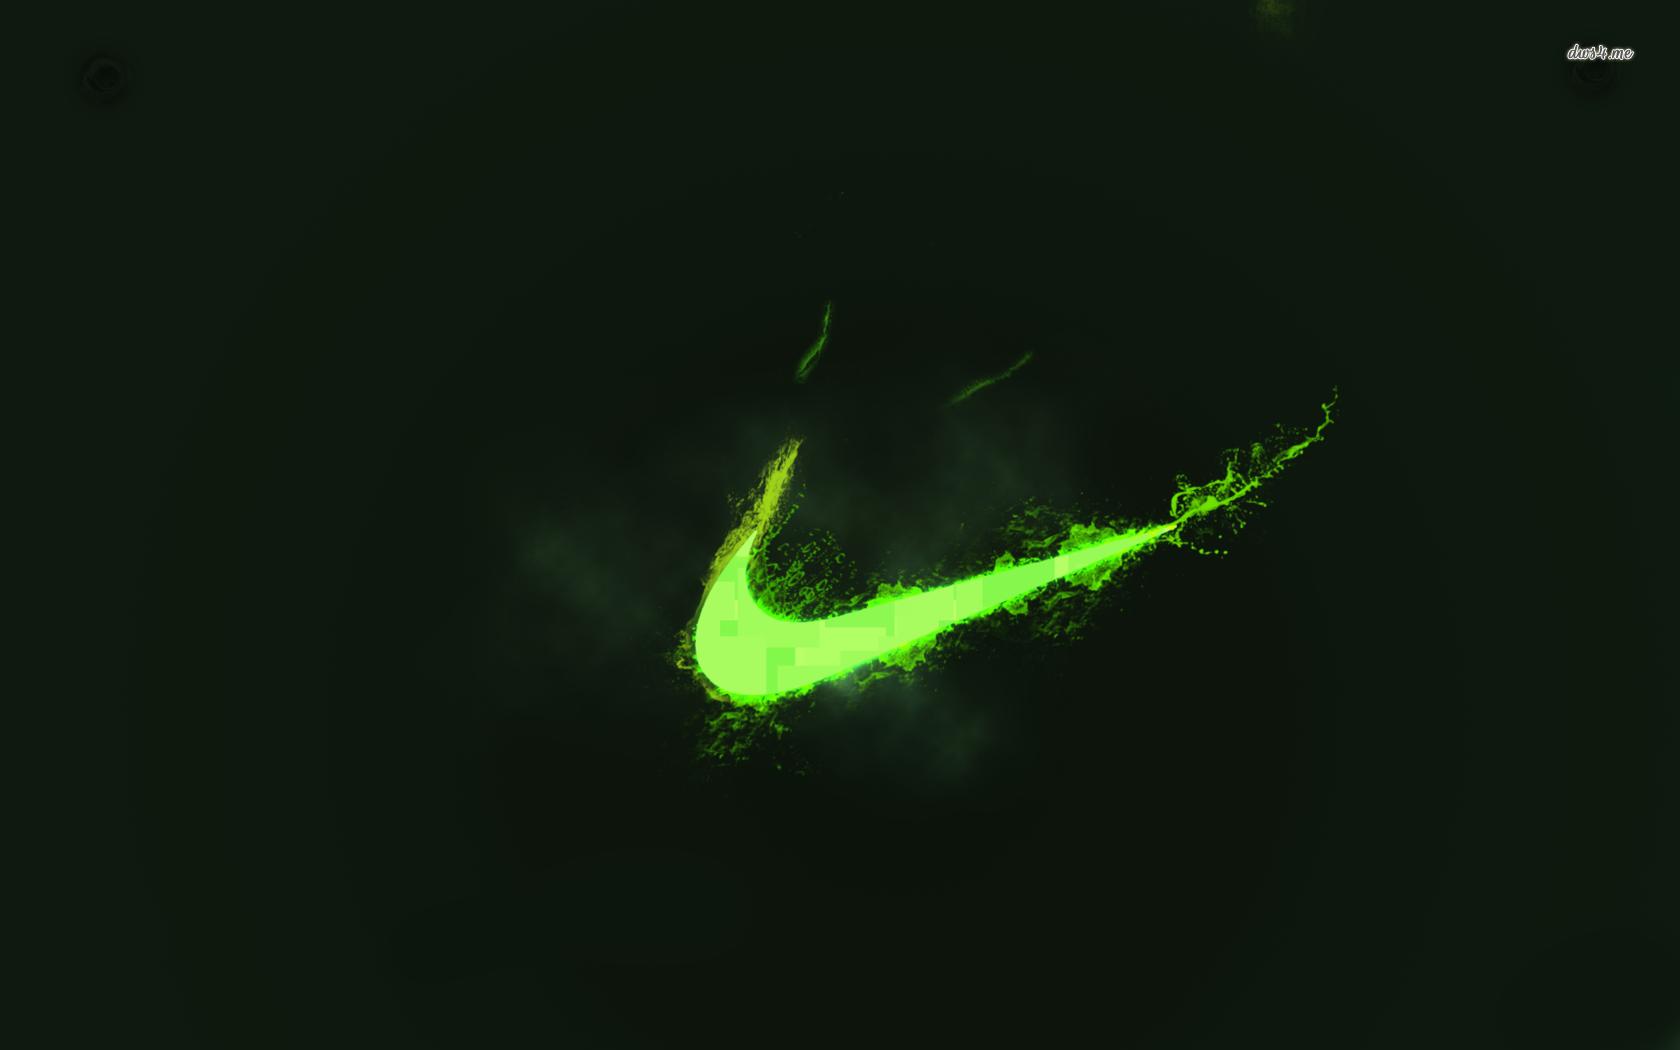 Neon green Nike logo wallpaper   Digital Art wallpapers 1680x1050